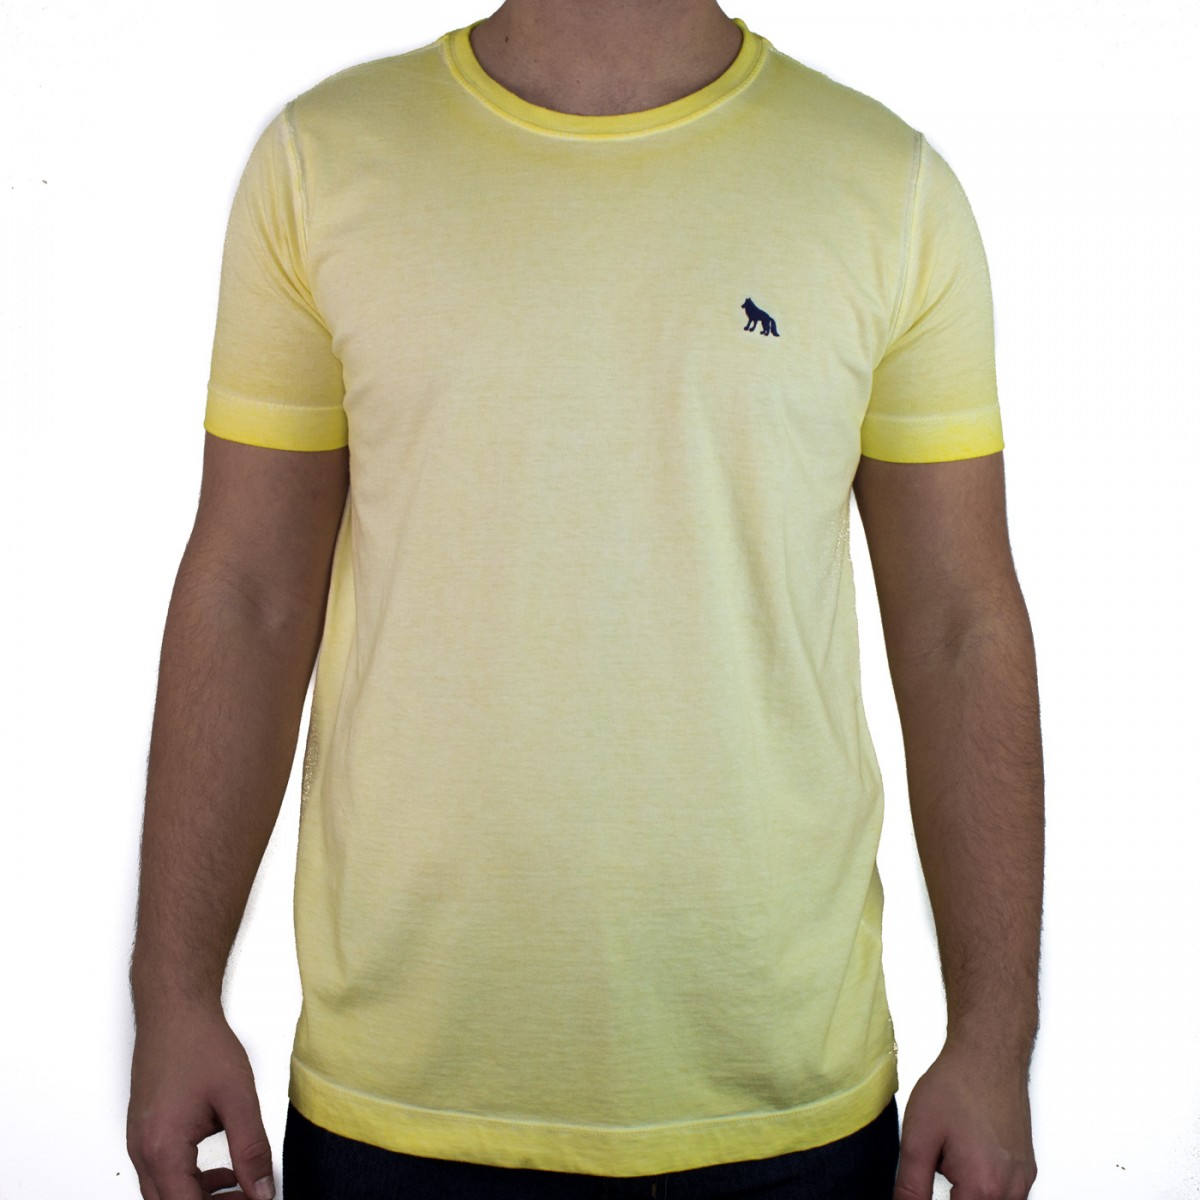 b5813f47c Bizz Store - Camiseta Masculina Acostamento Manga Curta Amarela